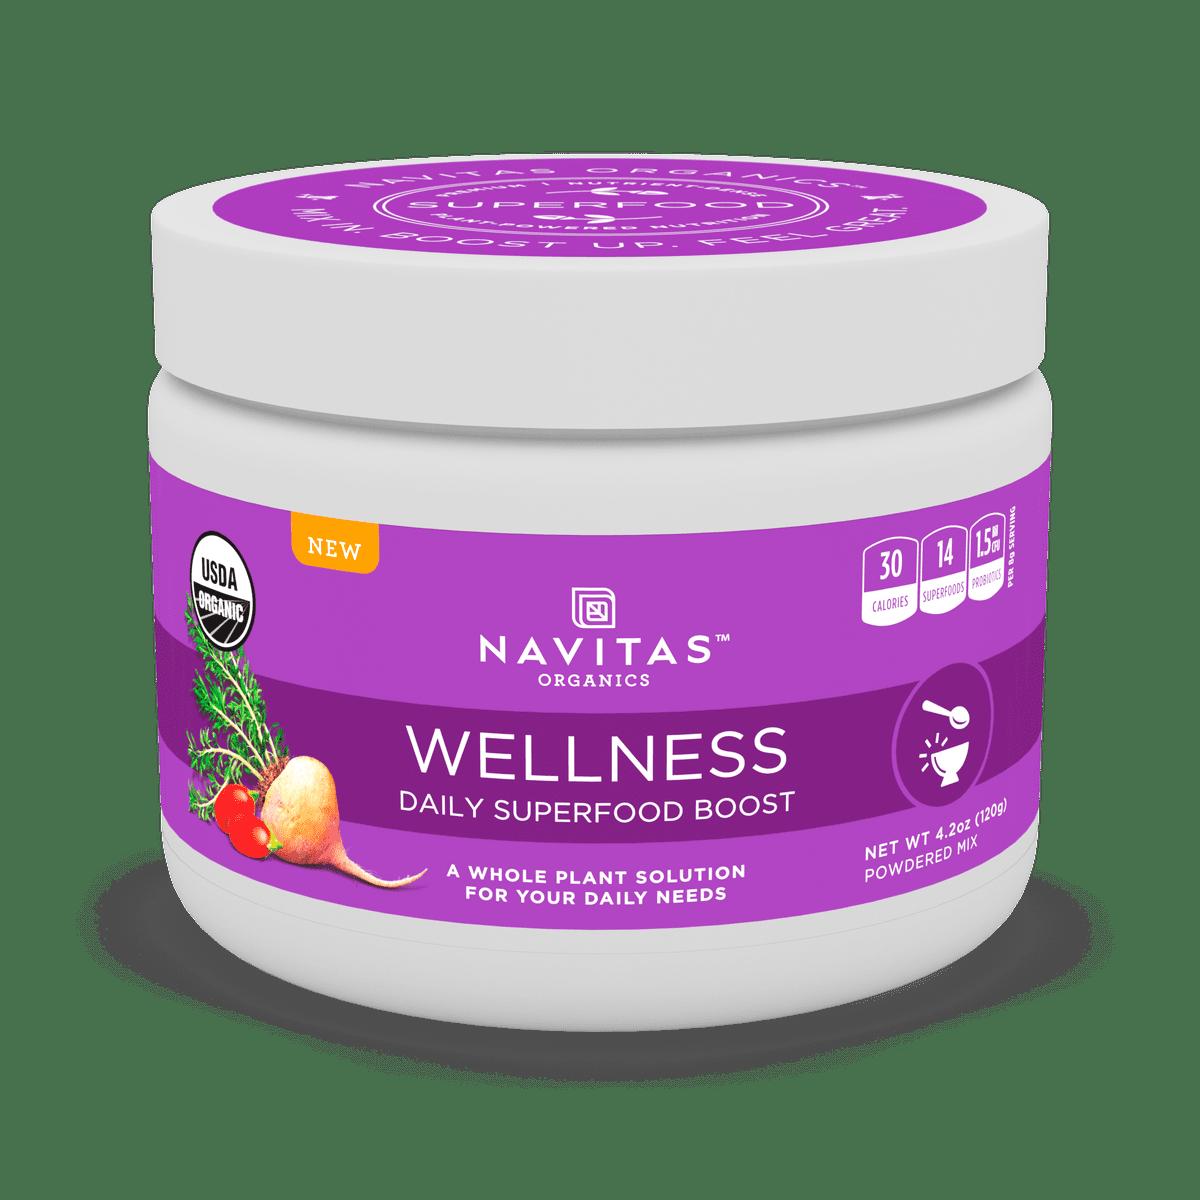 Navitas Organics Daily Wellness Superfood Powder, 4.2 Oz, 15 Servings